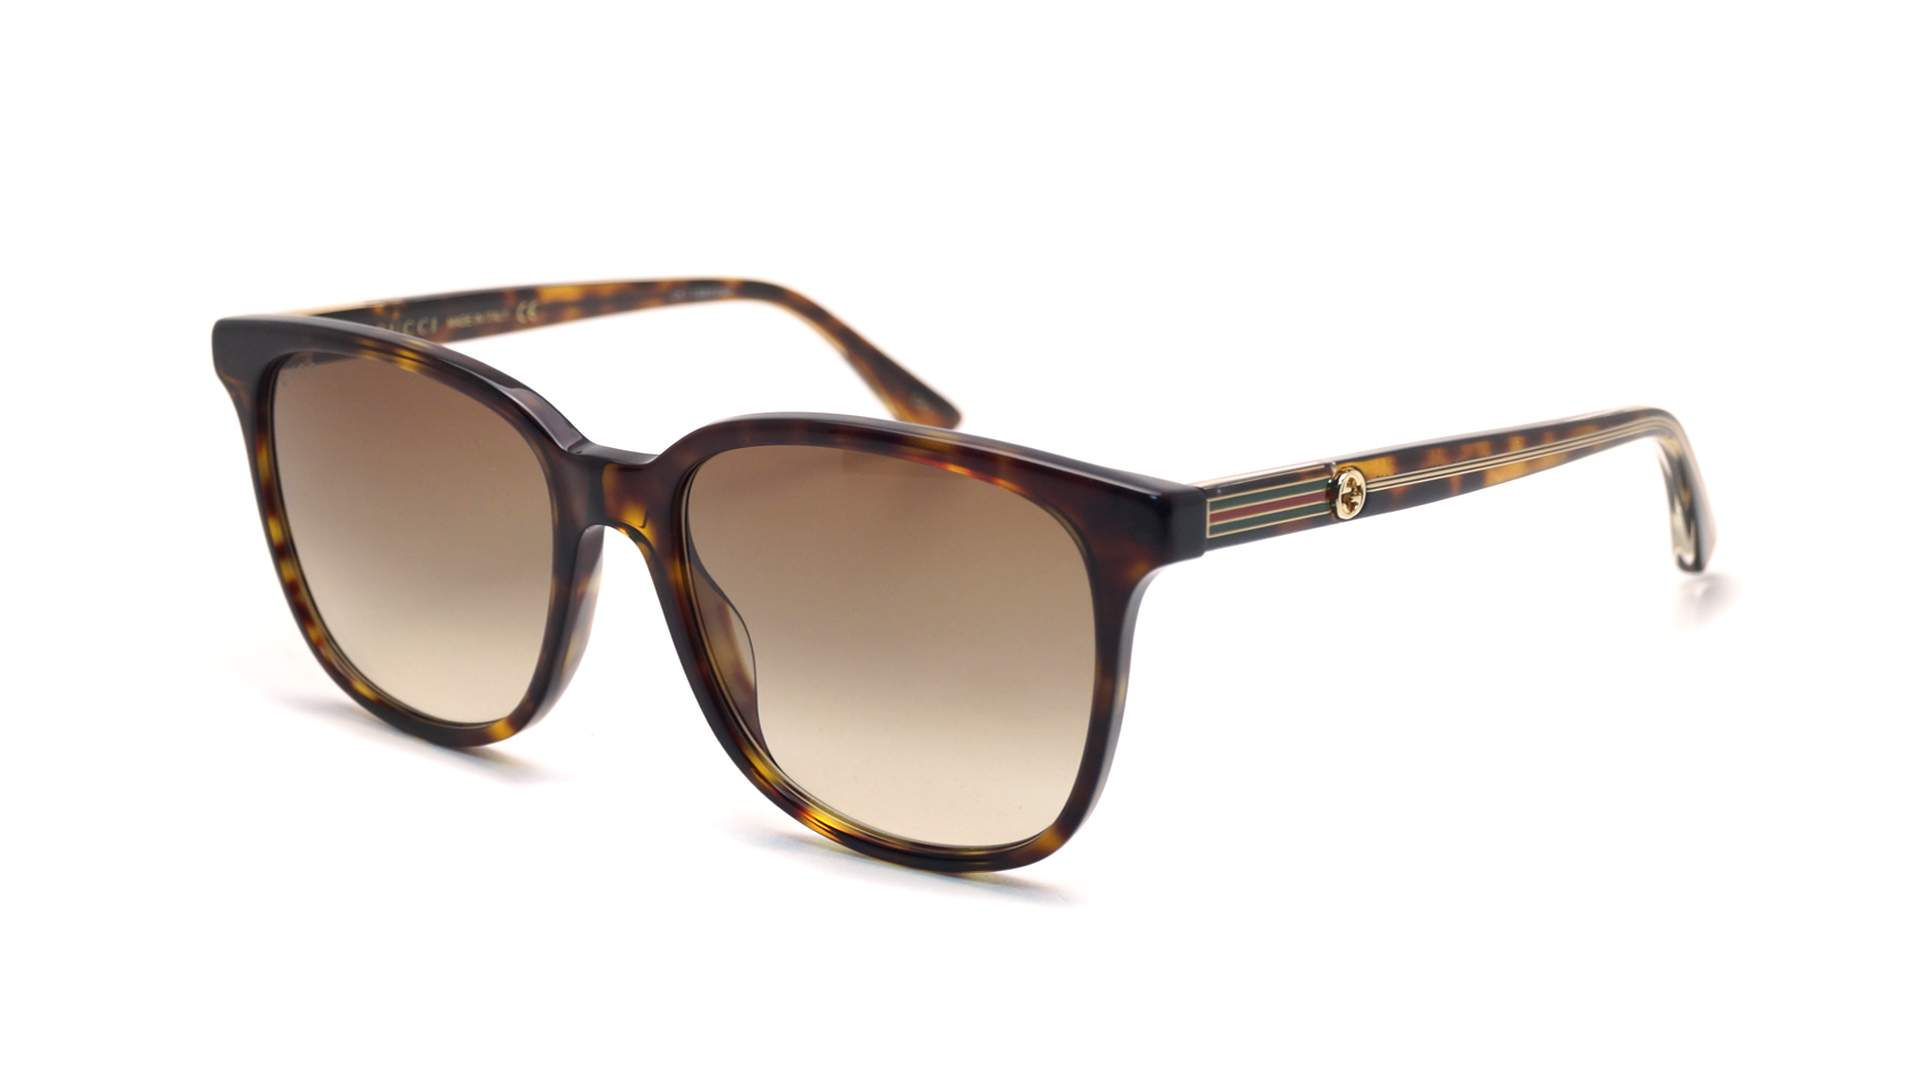 31ac3dced05 Sunglasses Gucci GG0376S 002 54-17 Tortoise Medium Gradient